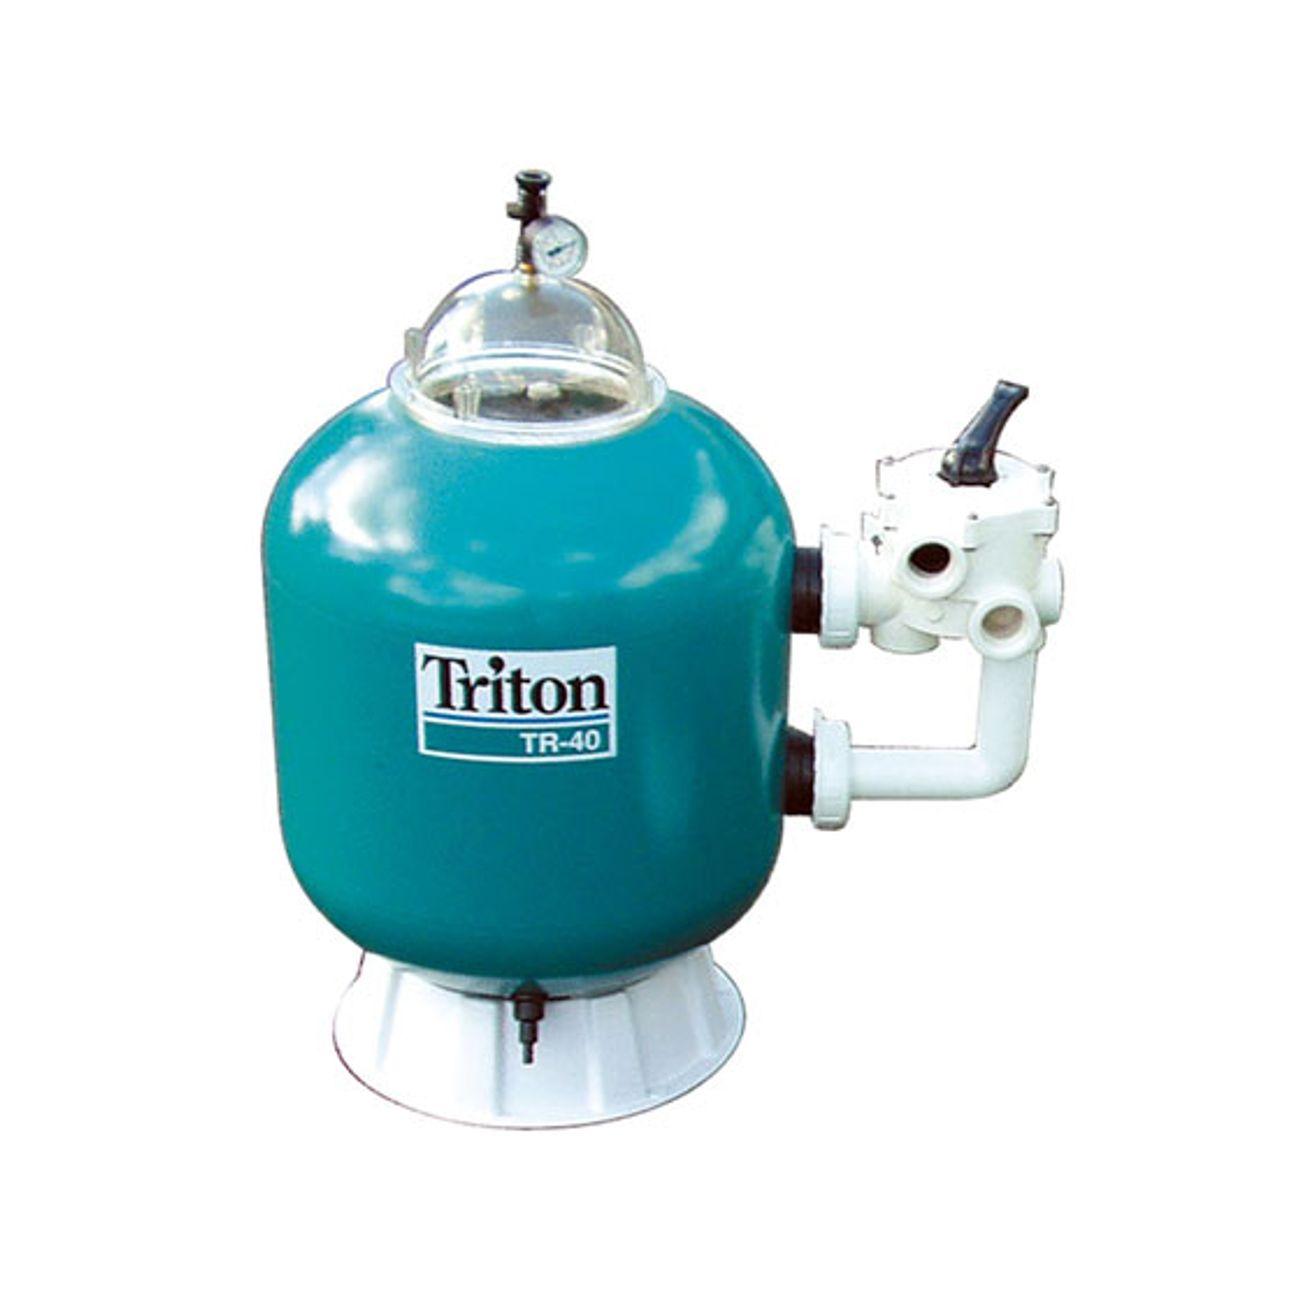 Filtration piscine sable triton tr60 14m3 h for Habitat et jardin piscine